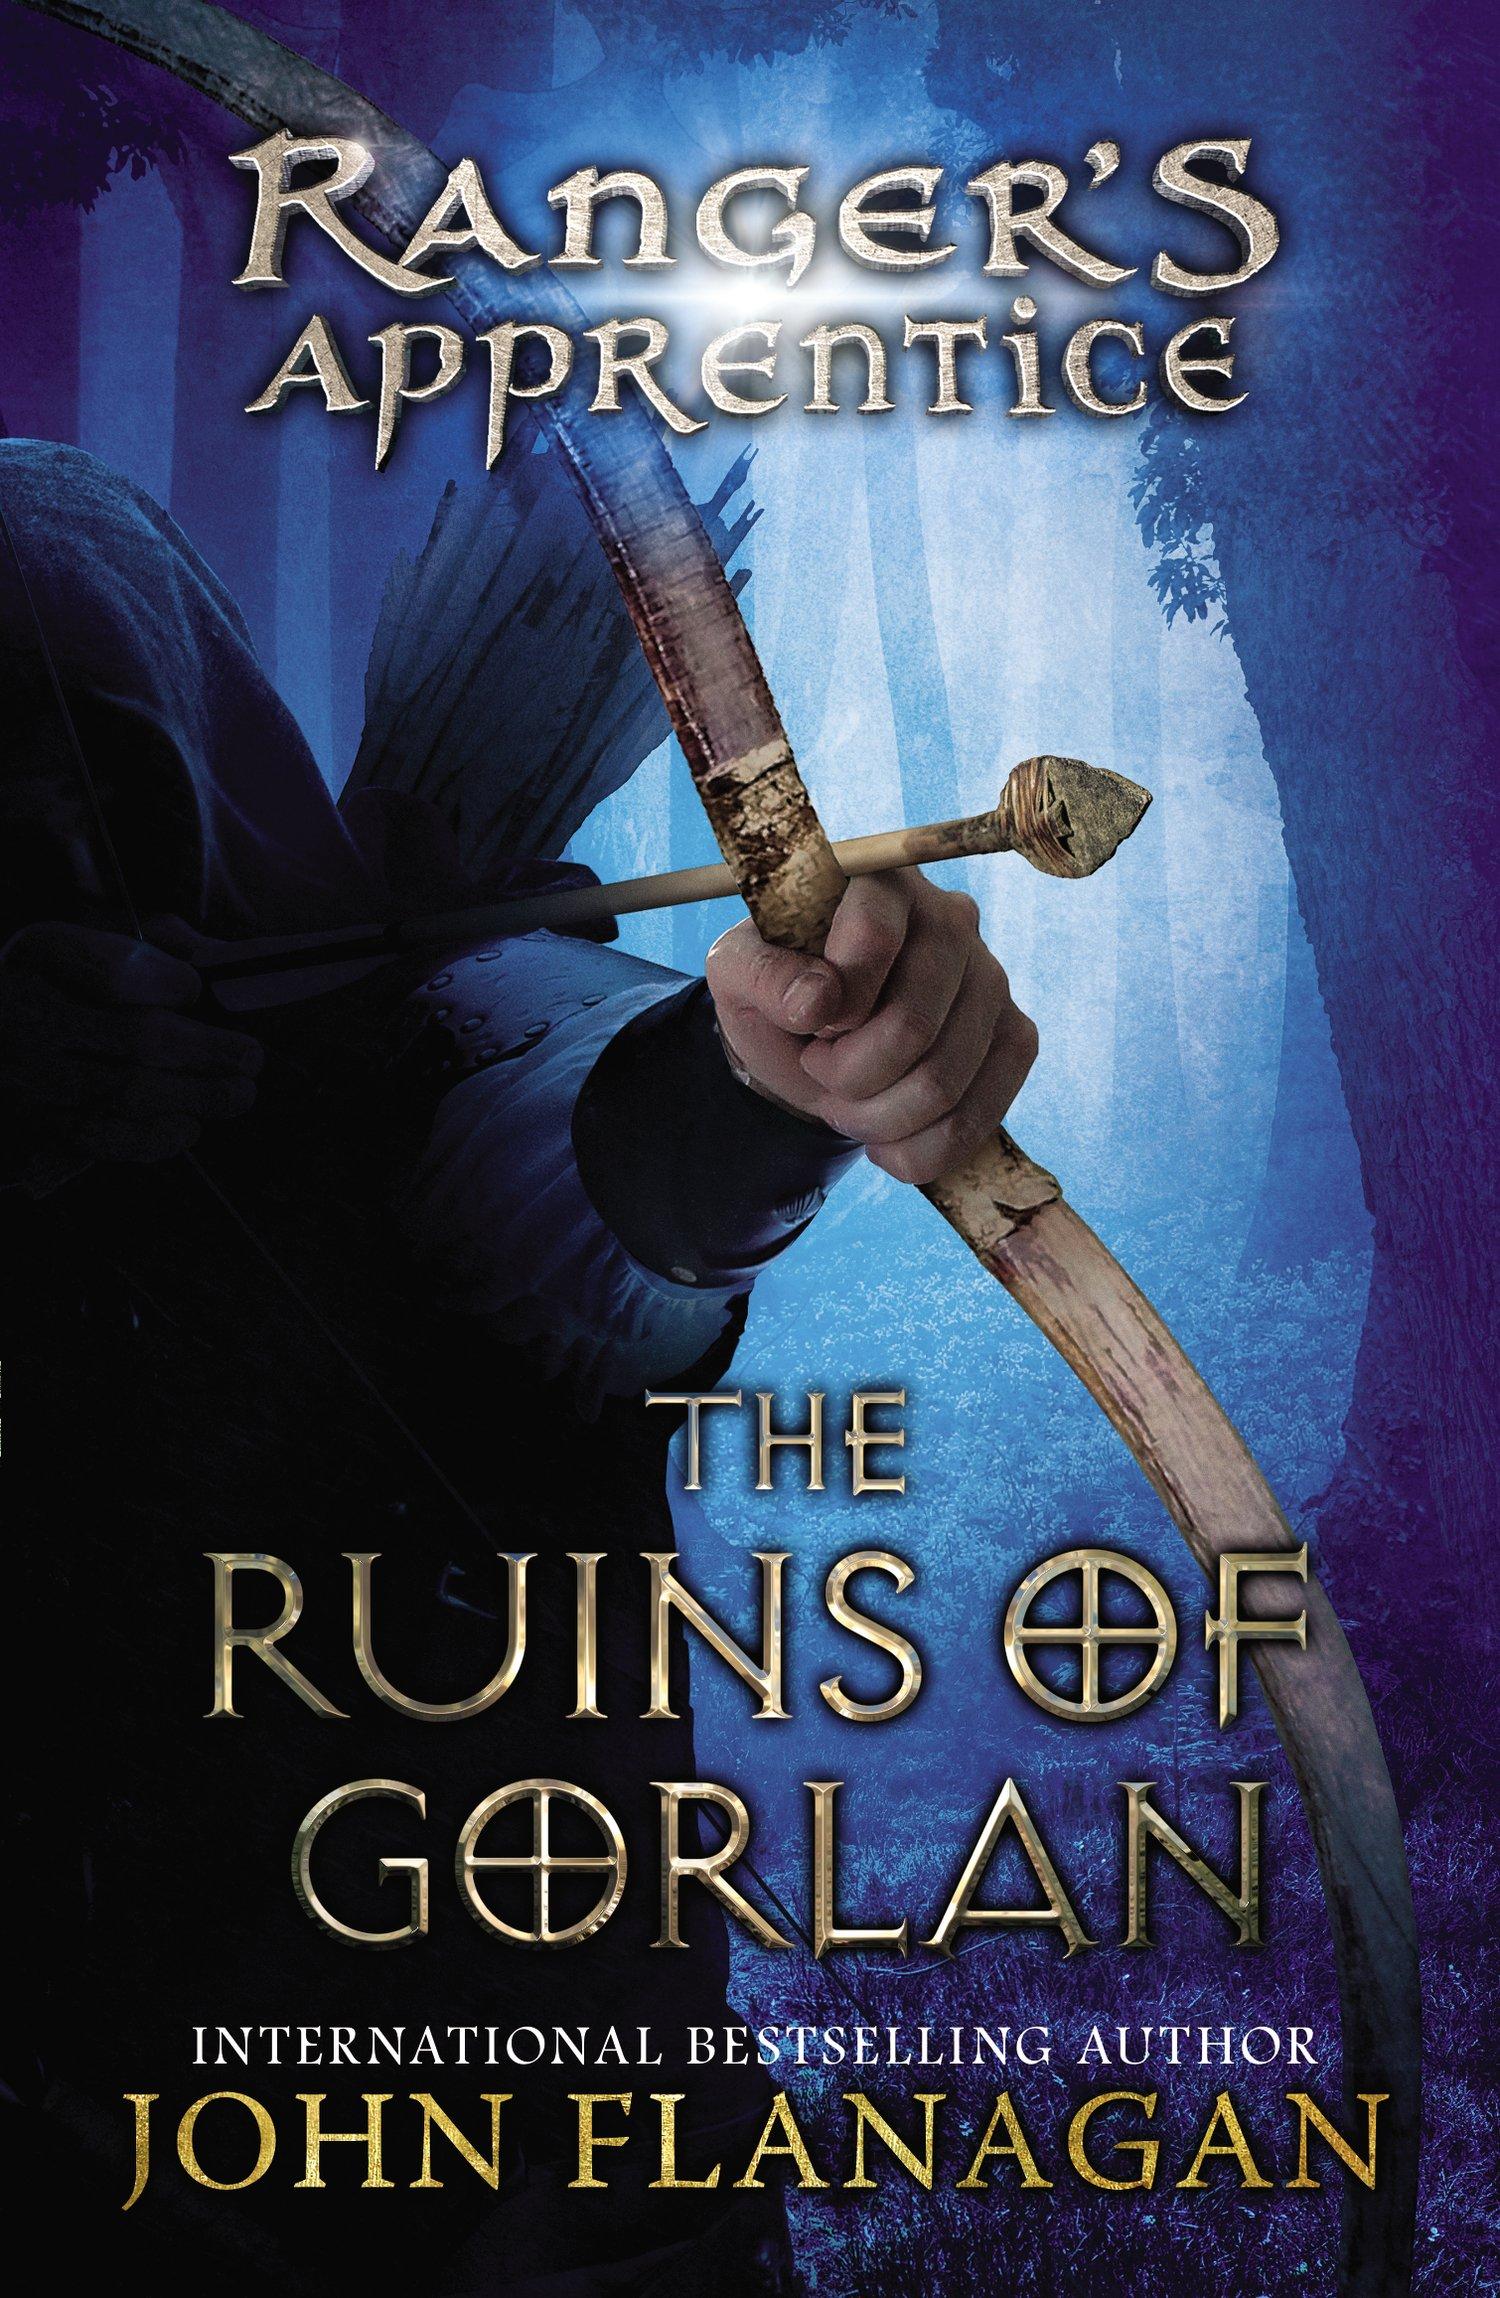 Ruins Gorlan Rangers Apprentice Book product image